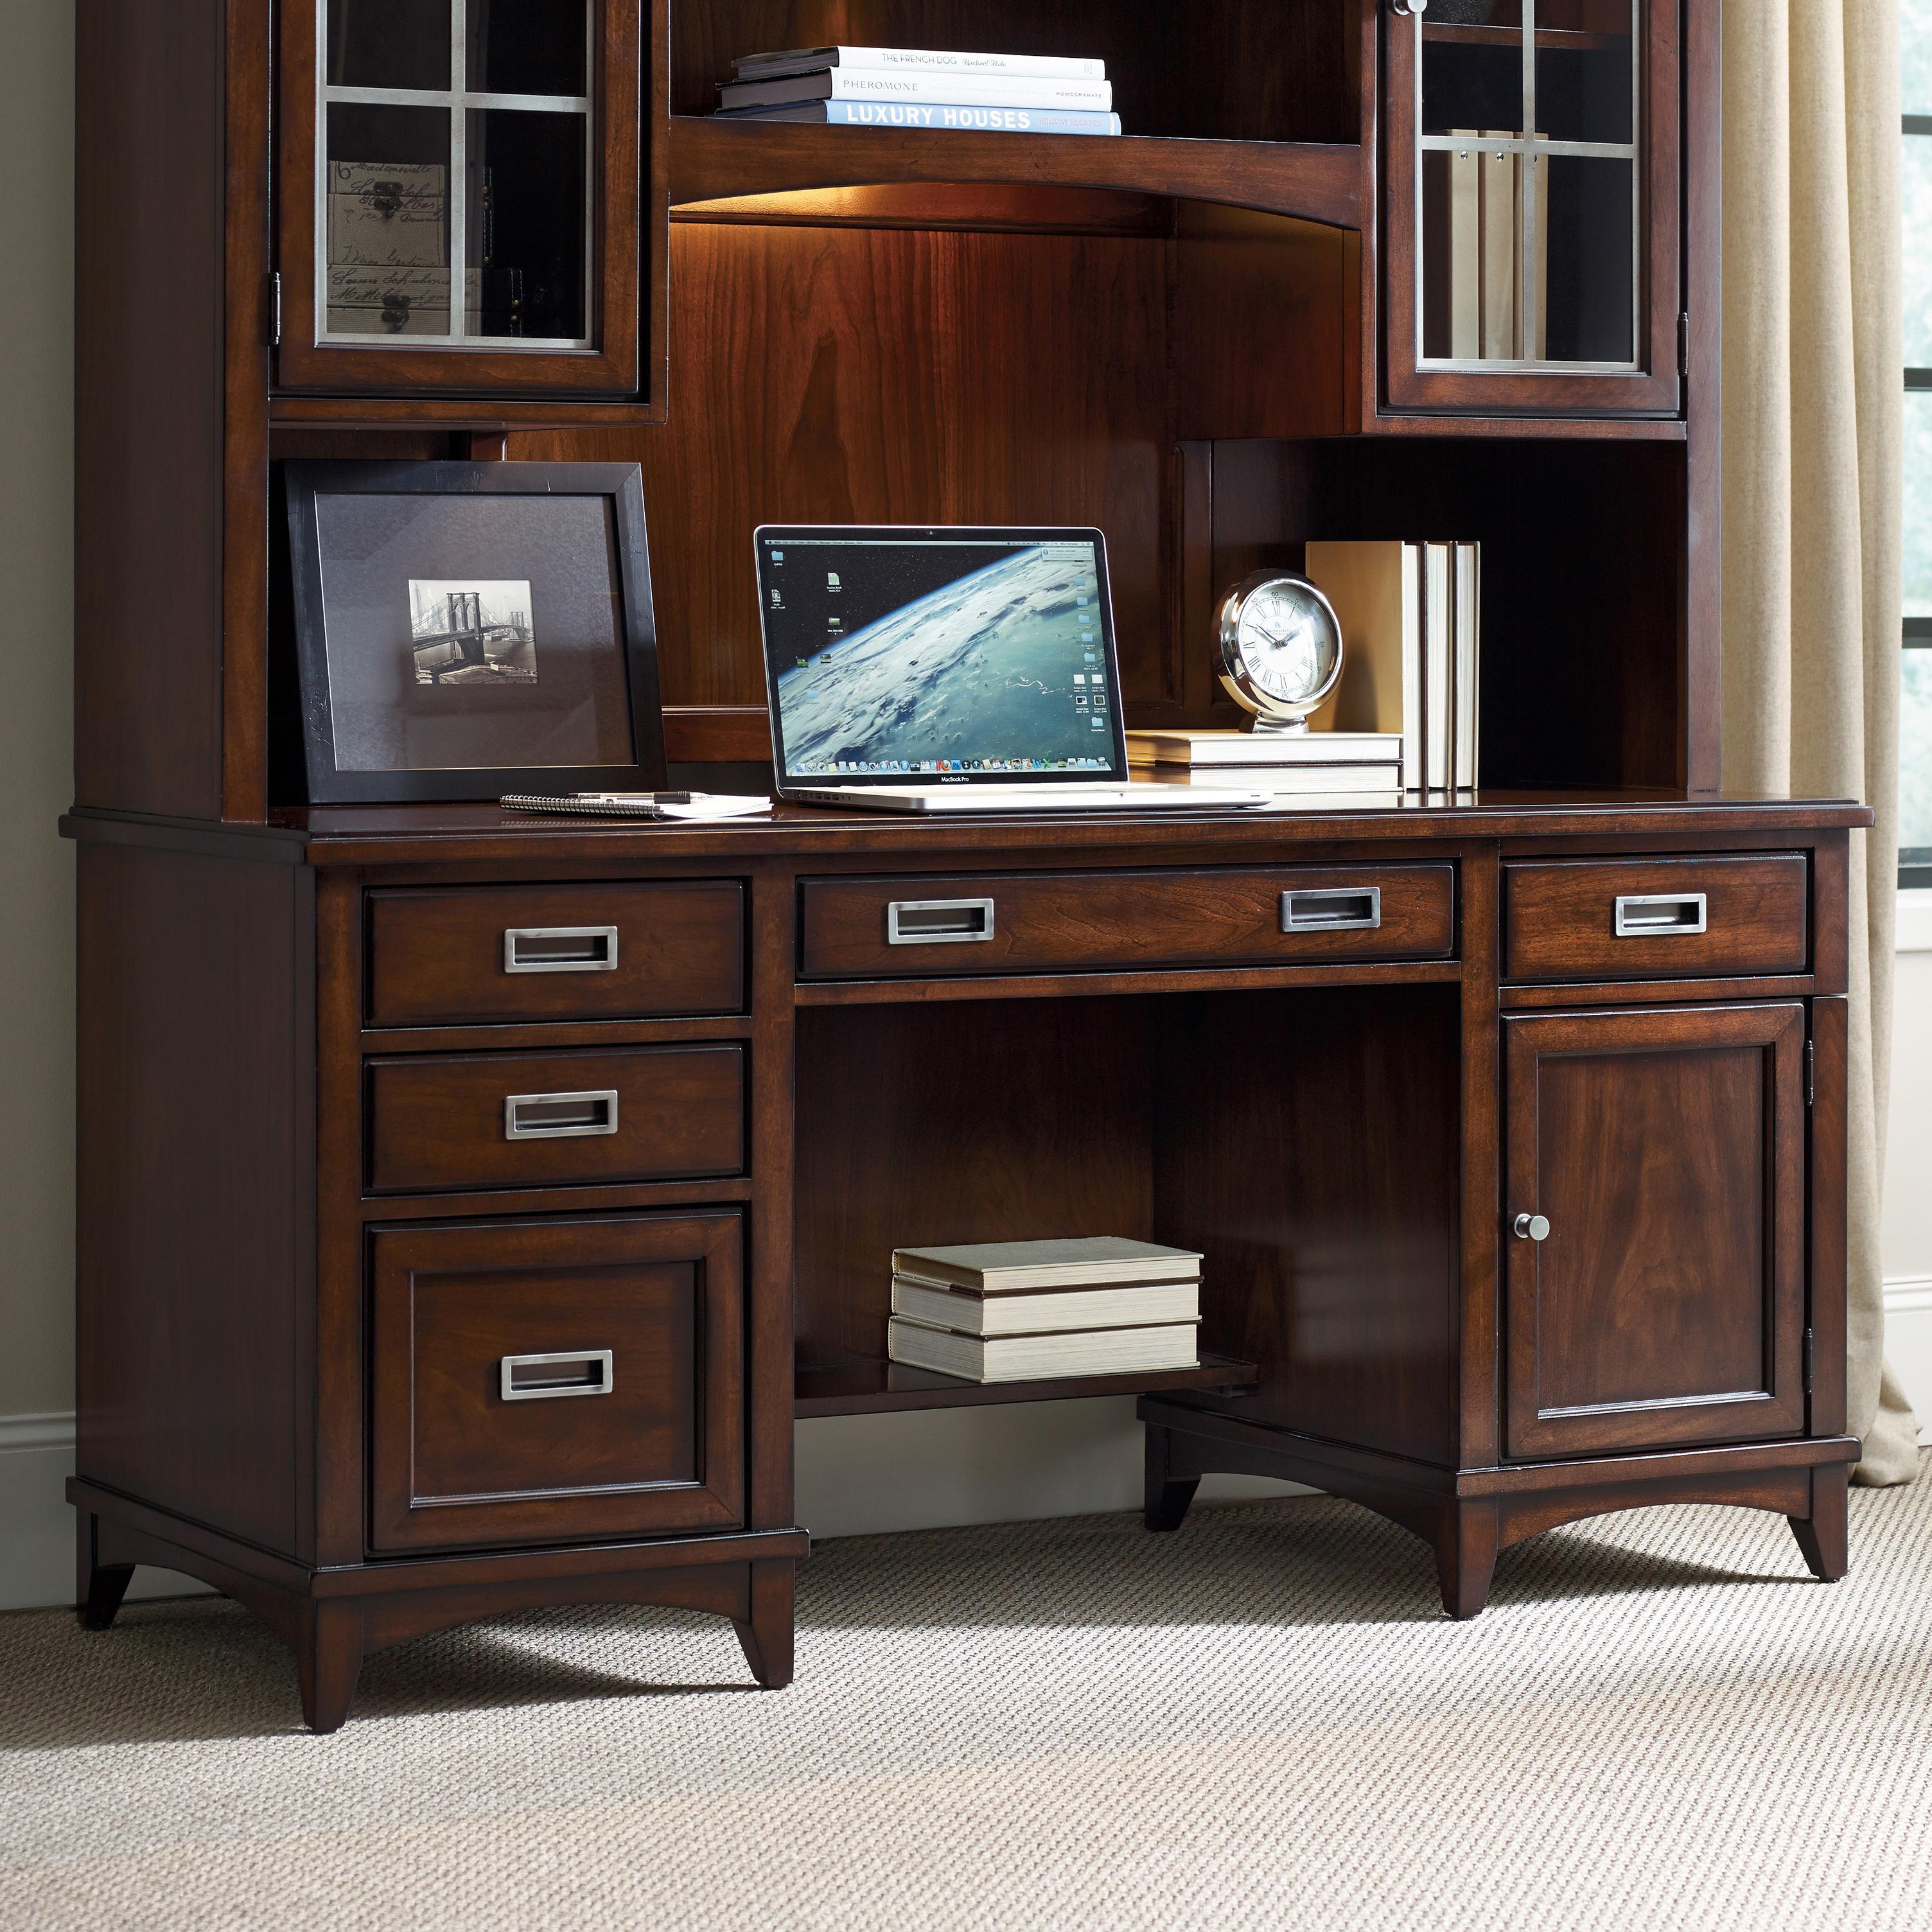 Etonnant Hooker Furniture Latitude Walnut Computer Credenza